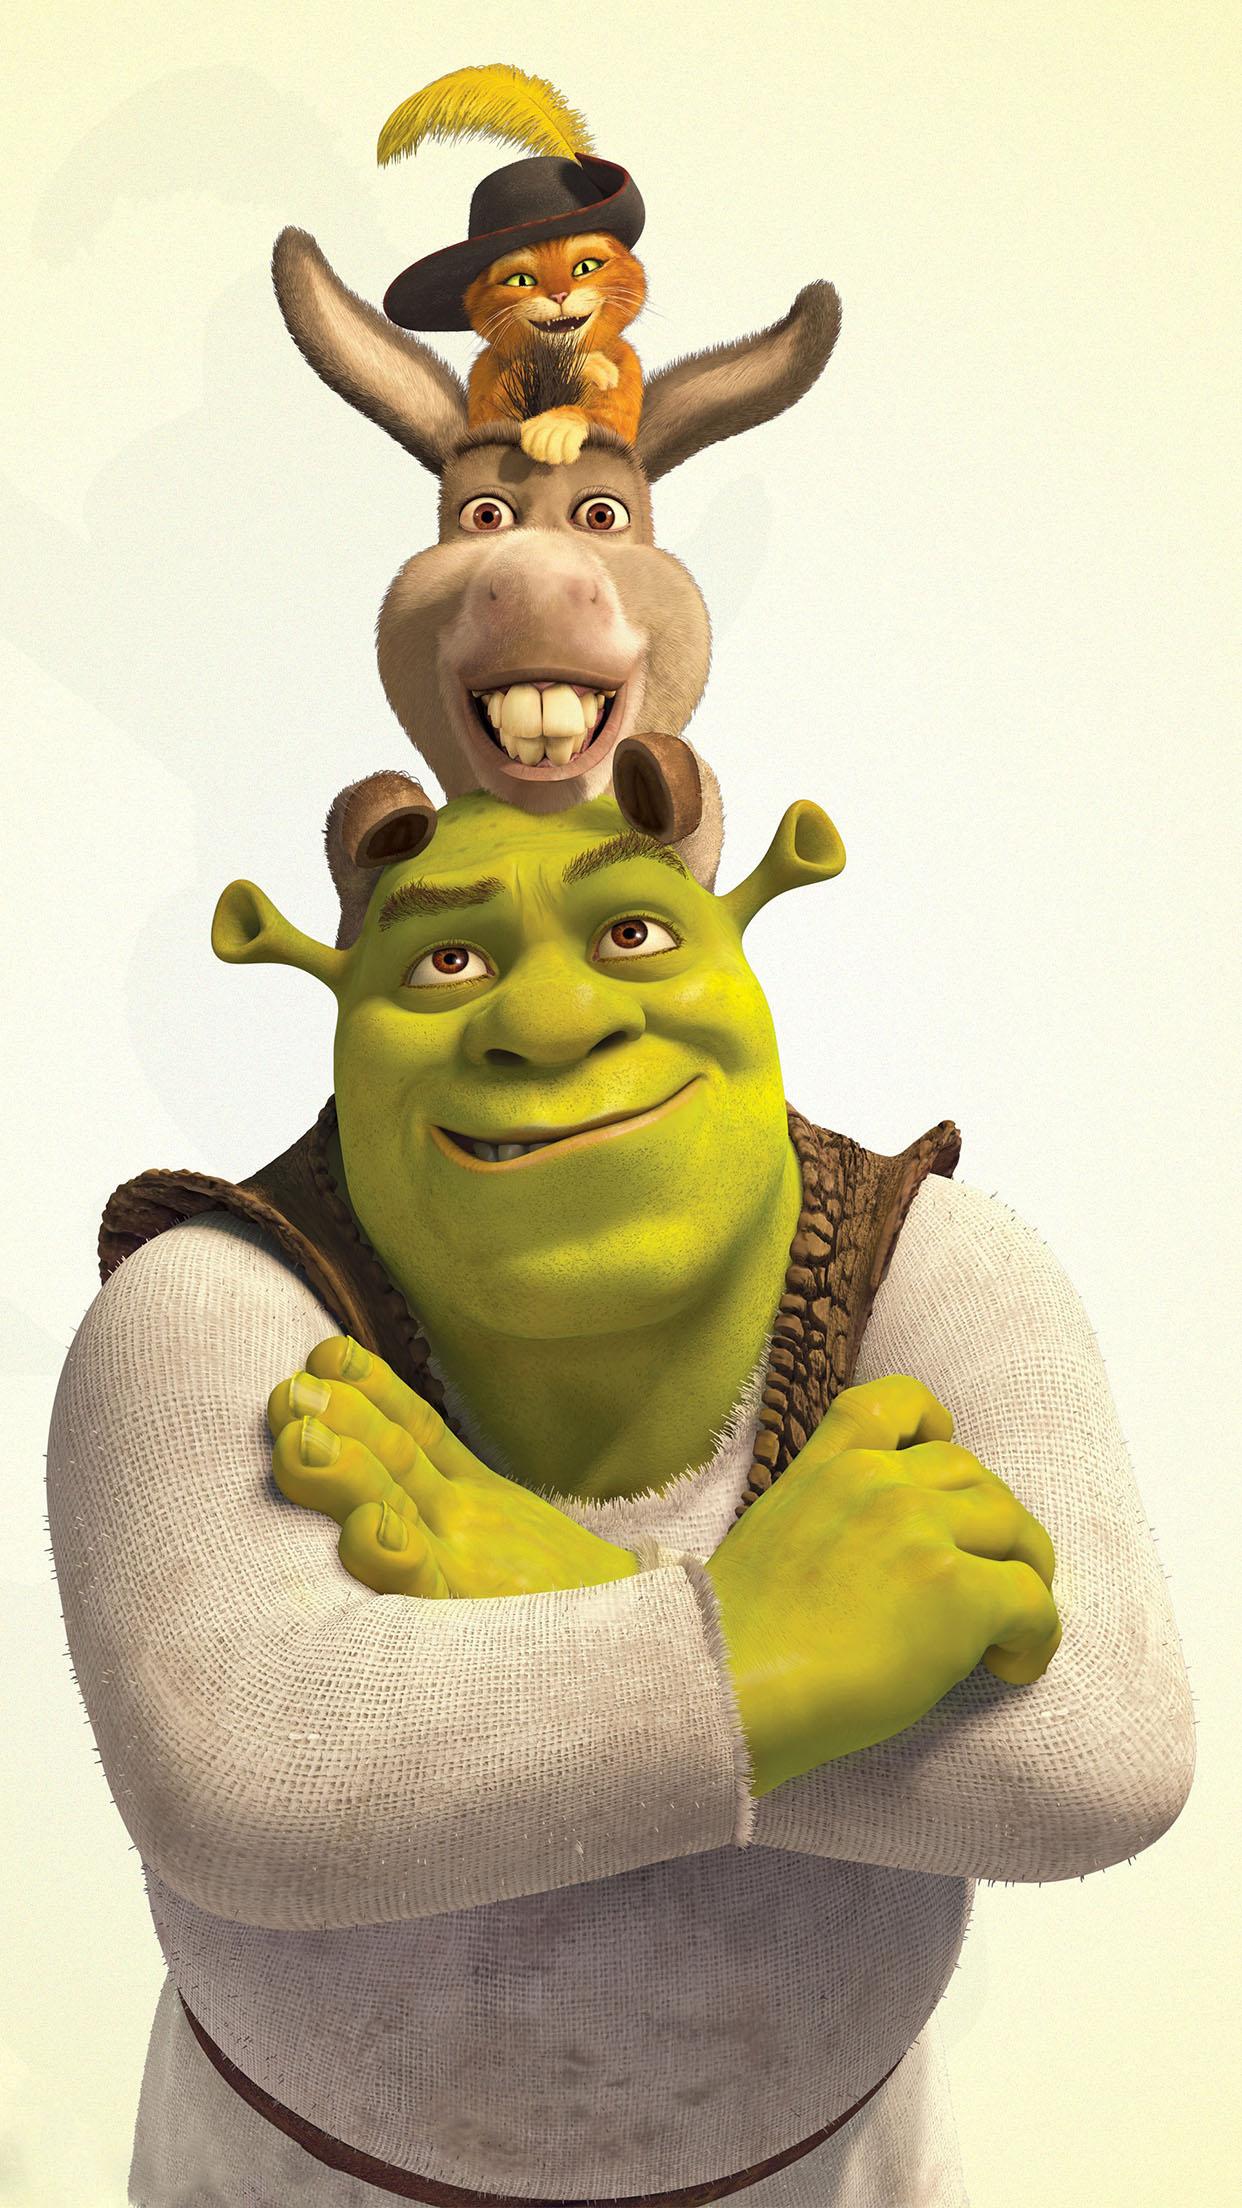 Shrek Shrek donkey and puss in boots 3Wallpapers iPhone Parallax 1 Shrek donkey and puss in boots